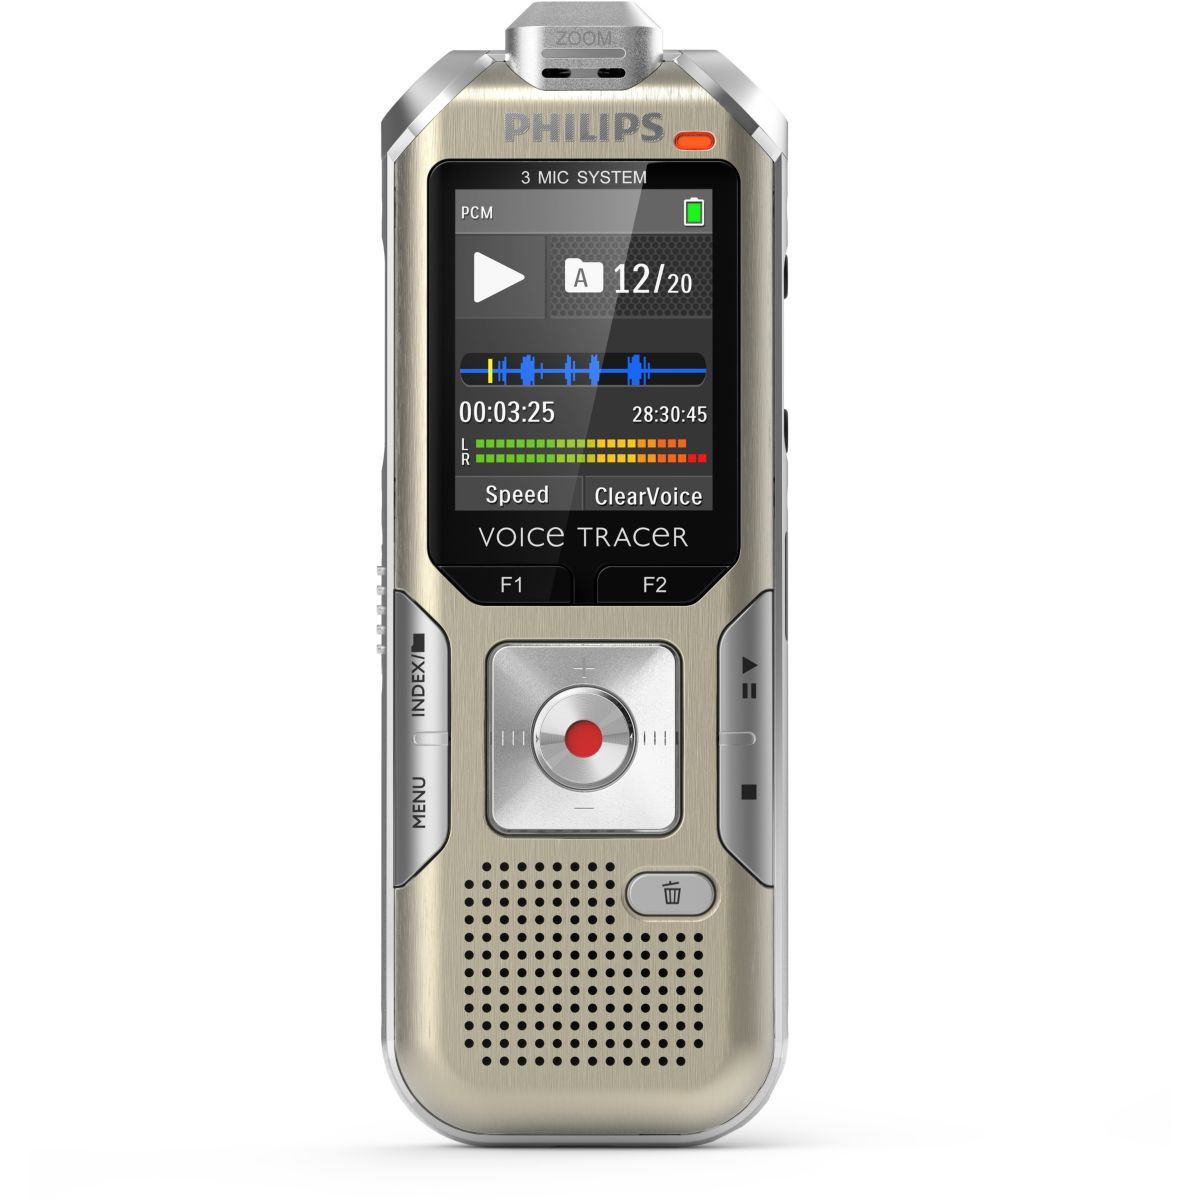 Dictaphone PHILIPS DVT6510 (photo)